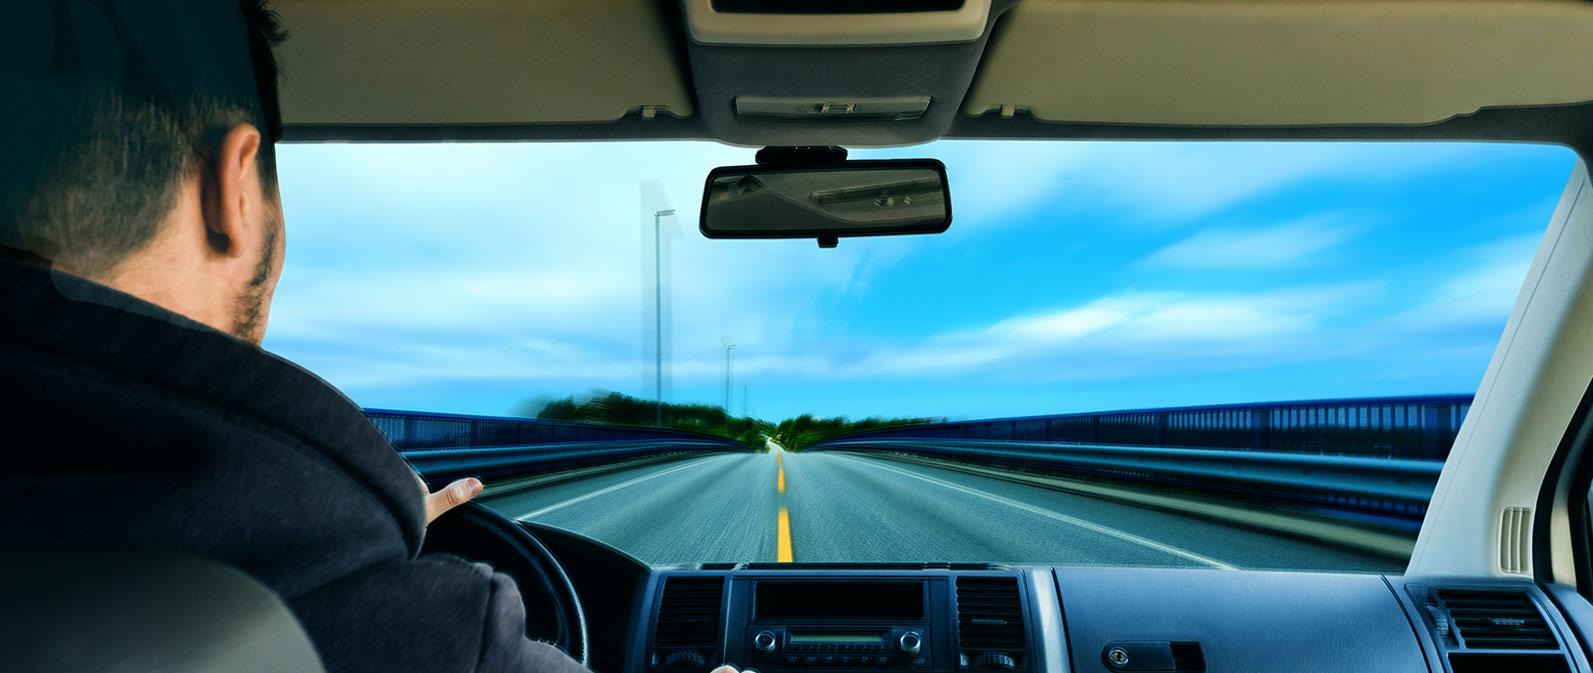 10 claves para enfrentarse a un viaje largo en coche